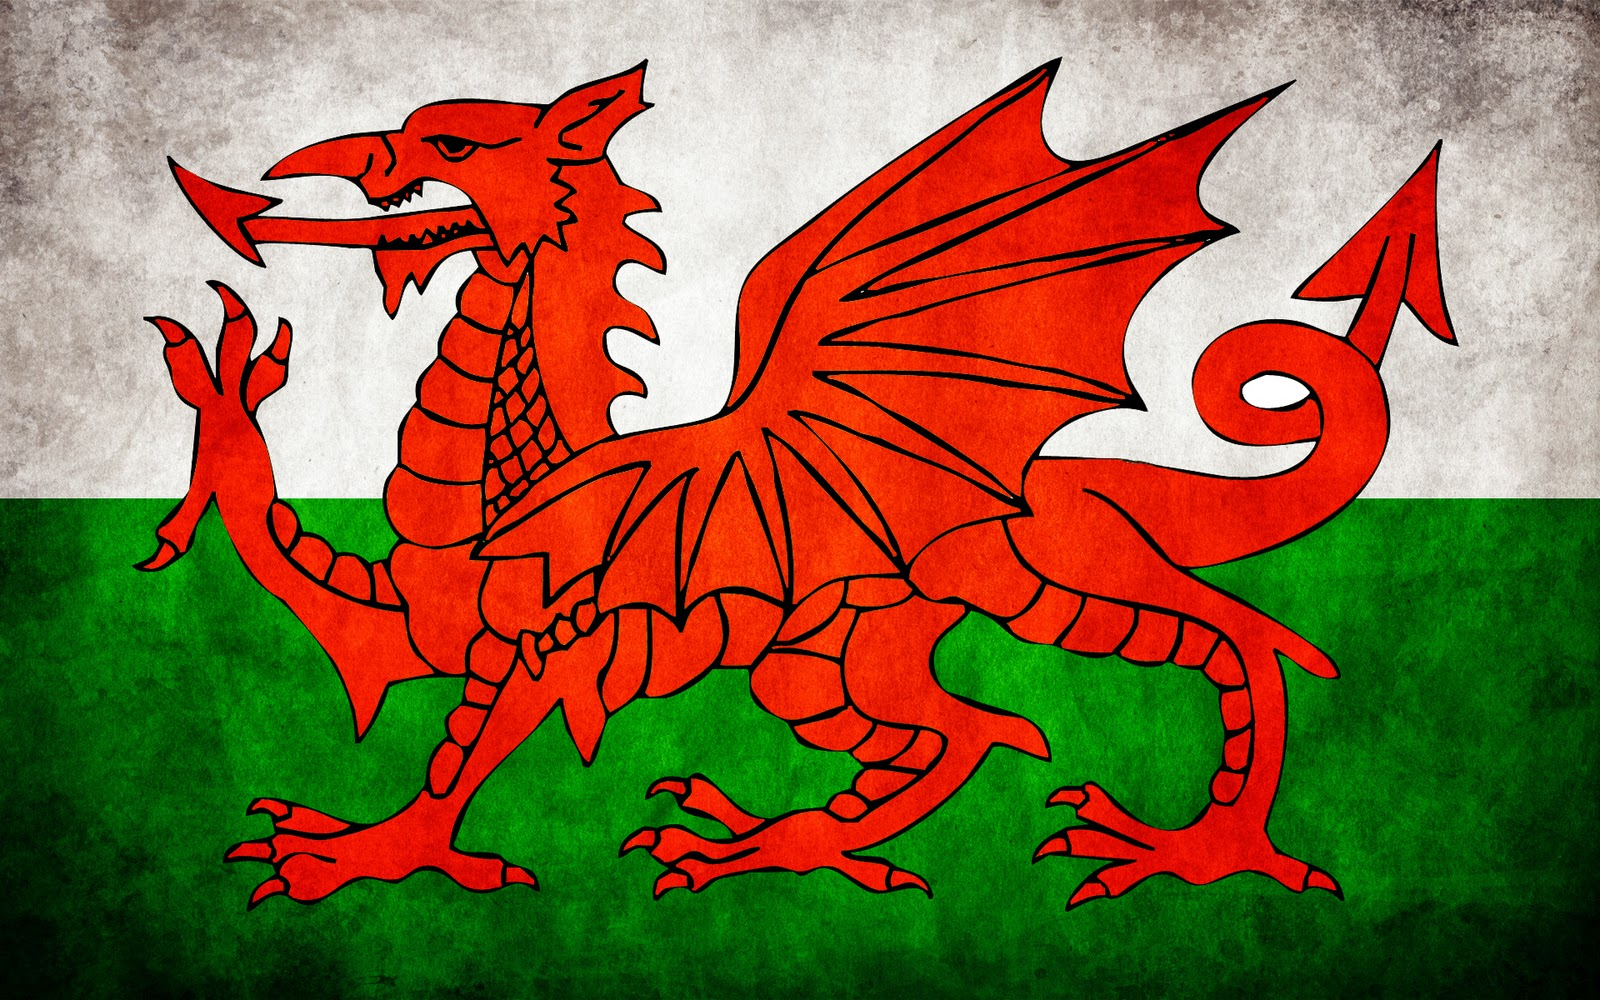 Wales National Football Team 2015 The Dragons HD Desktop Wallpaper